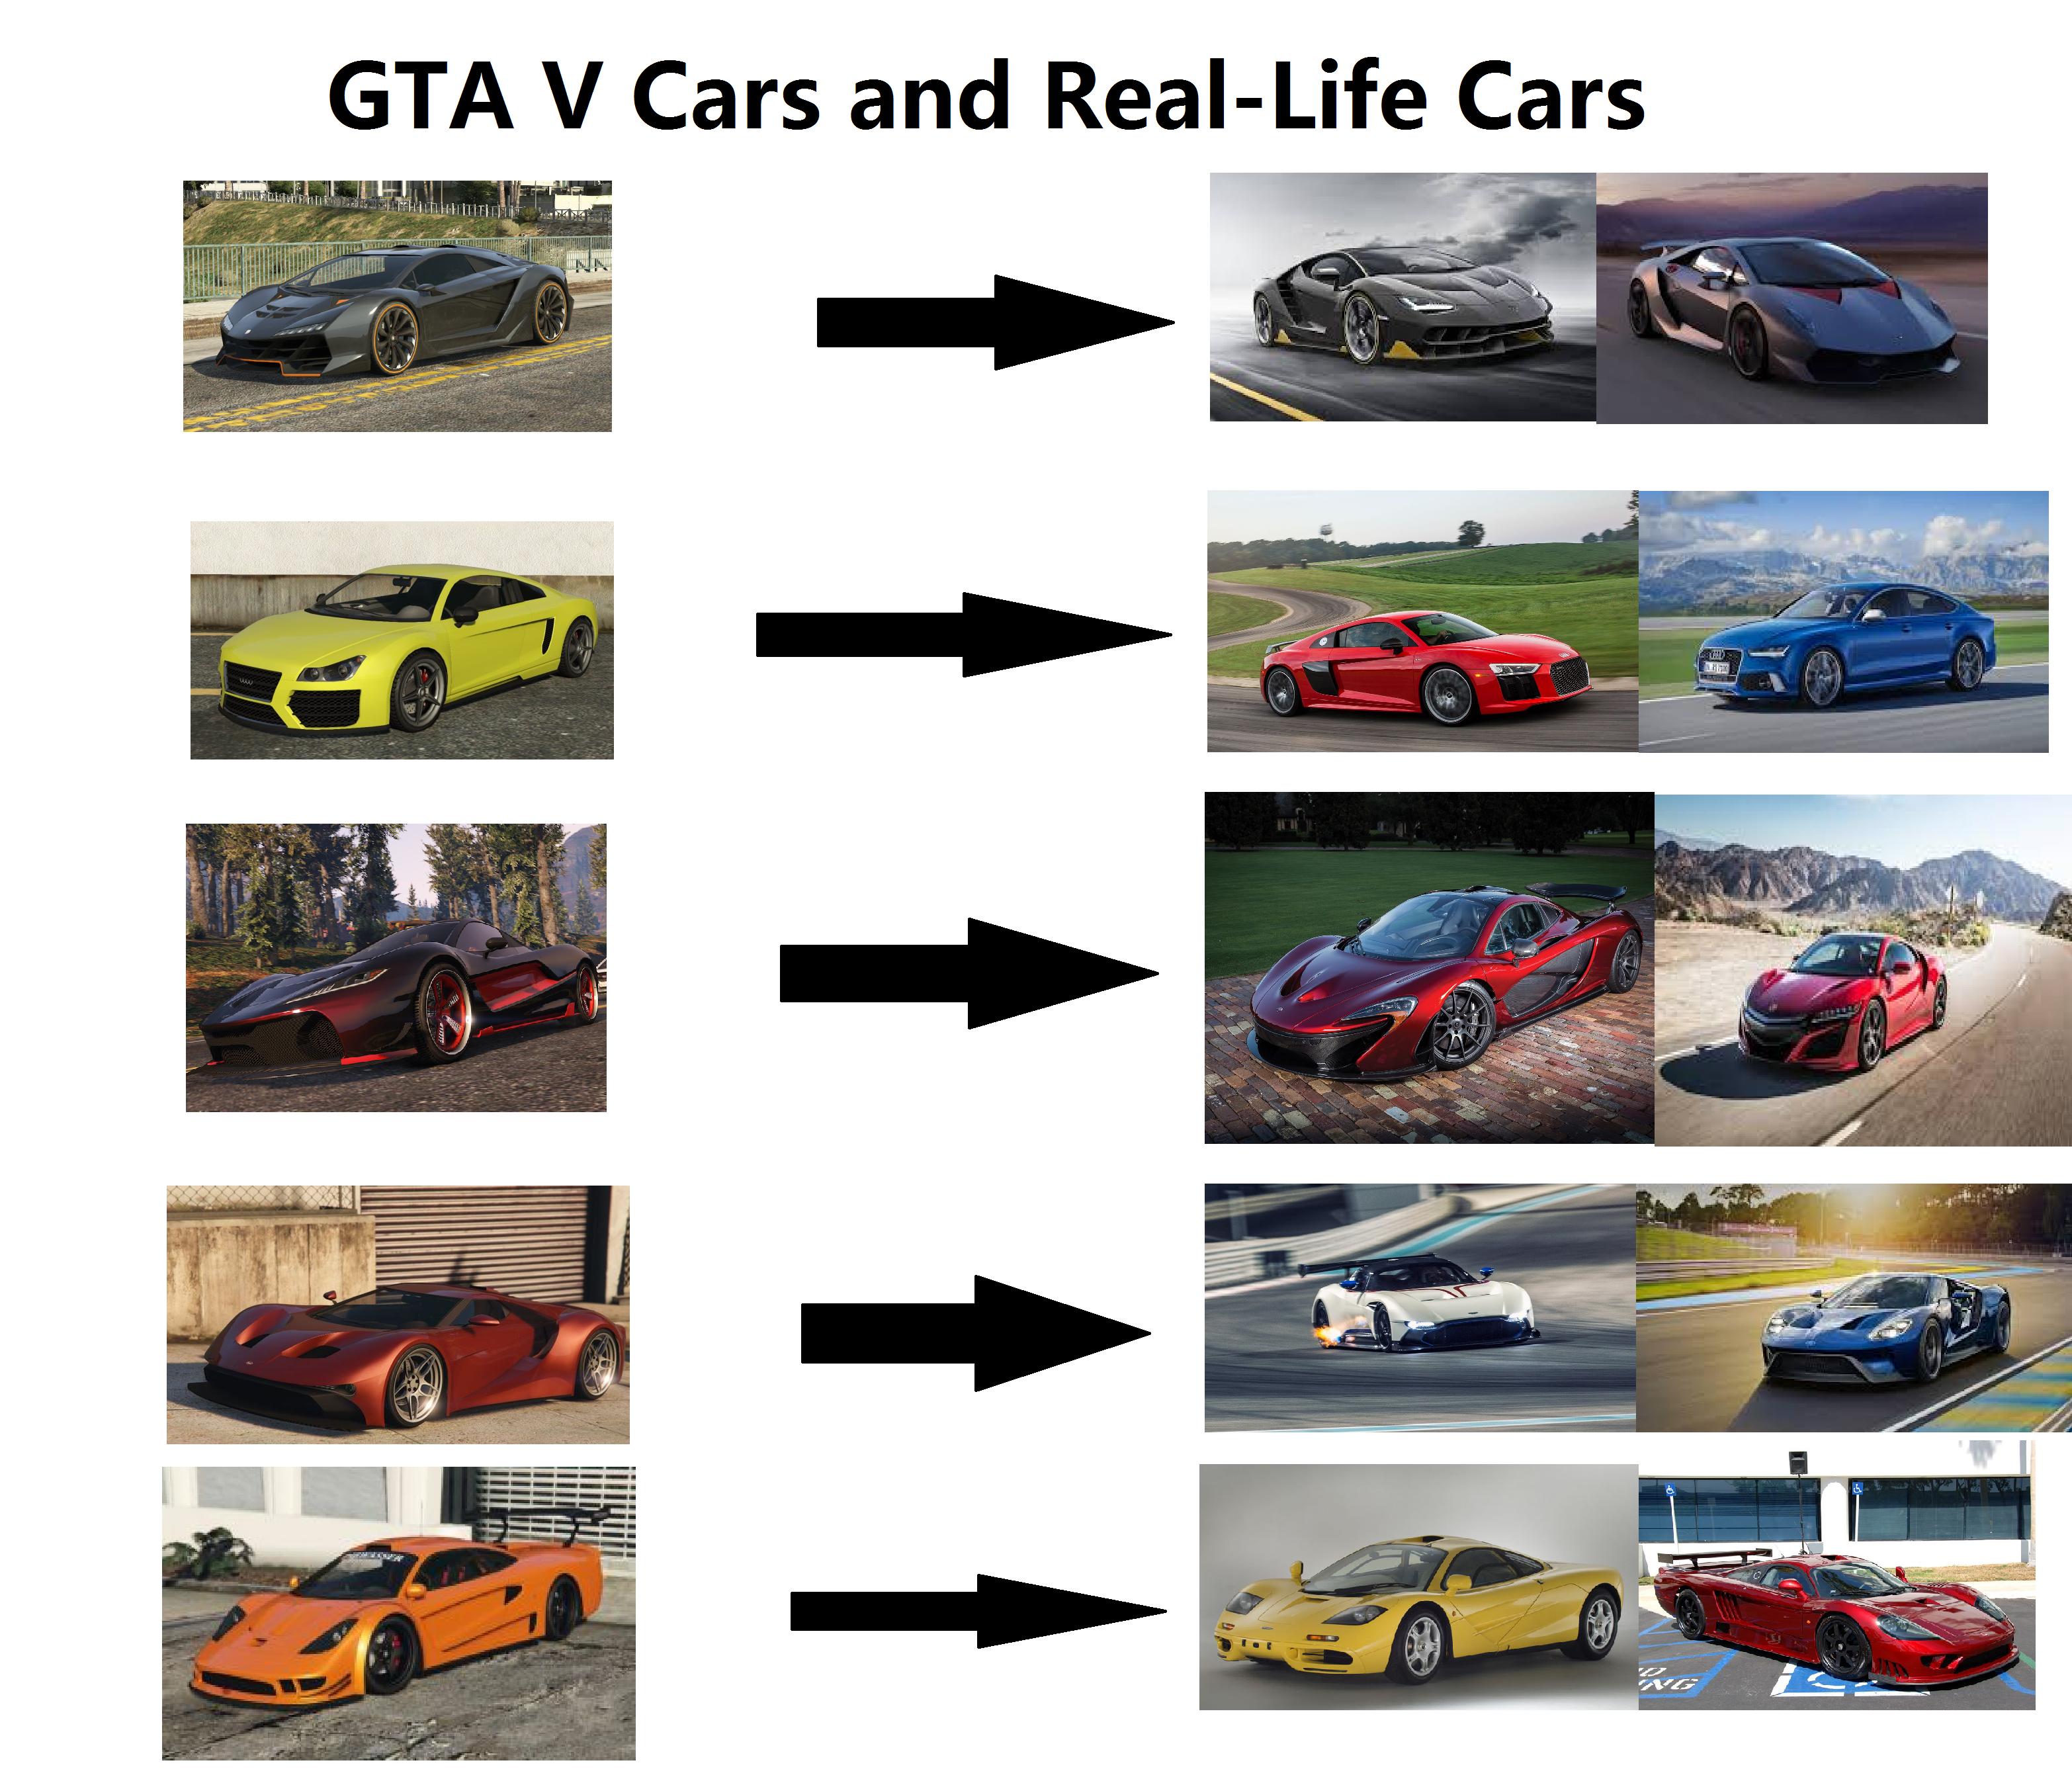 GTA V Cars Converted To Real Life Cars